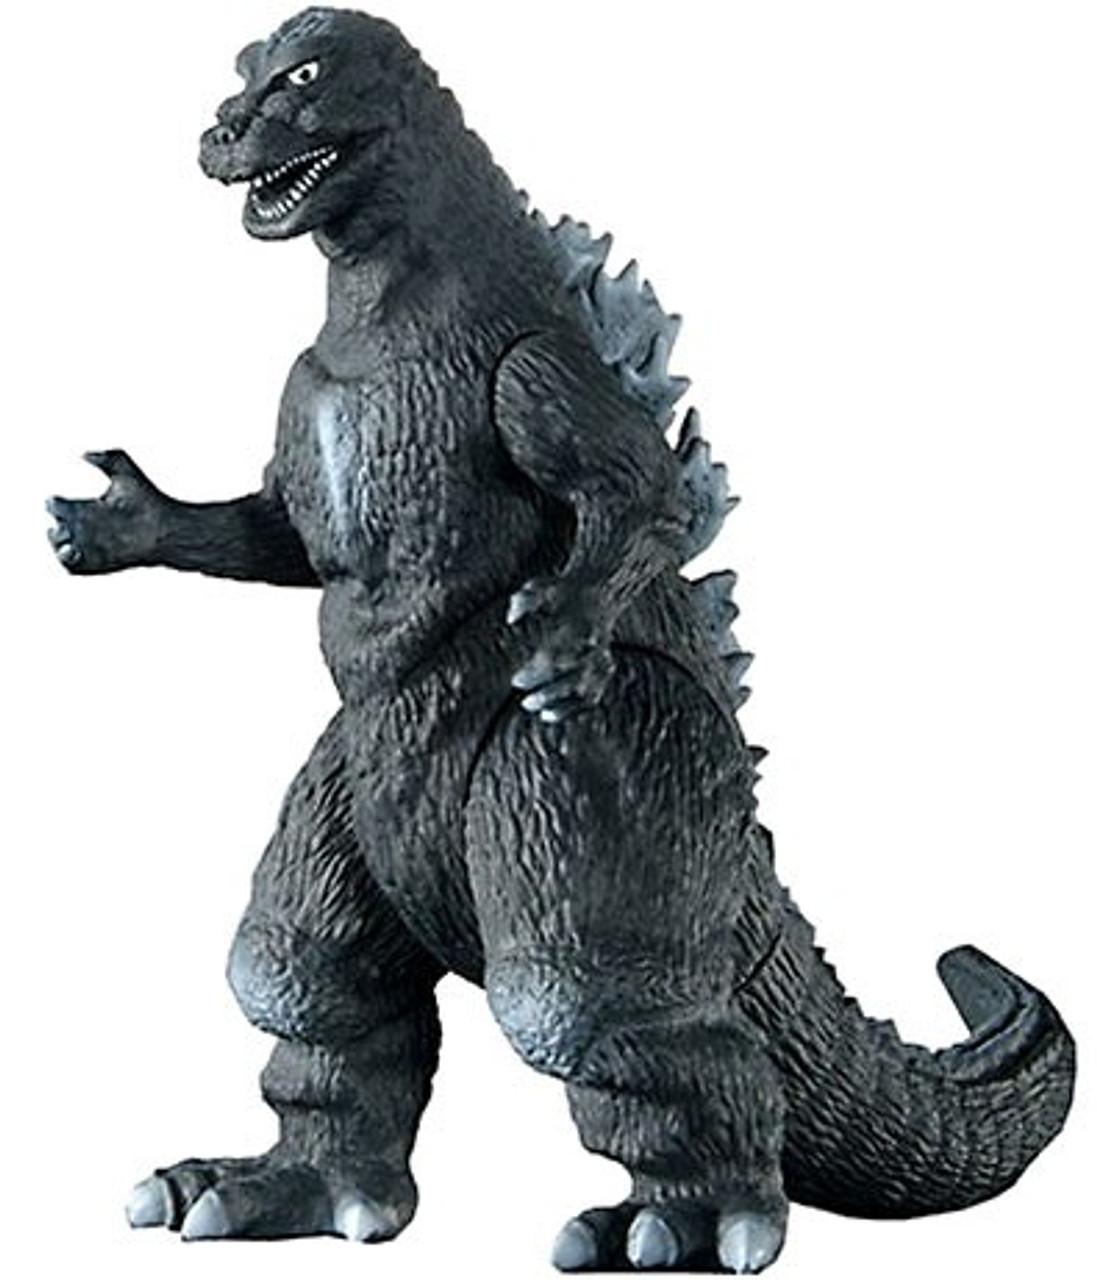 Godzilla 1954 6-Inch Vinyl Figure